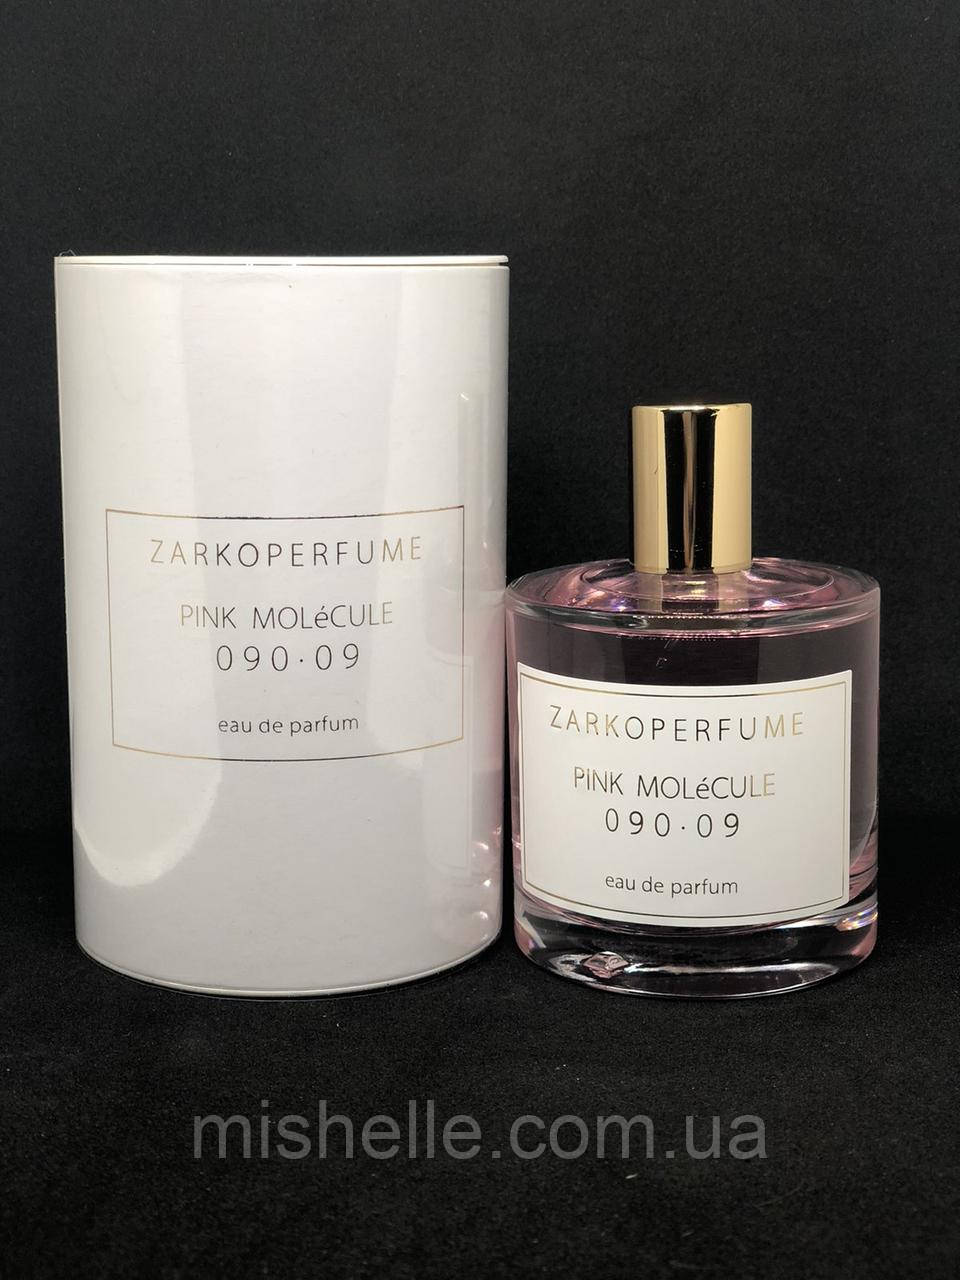 Парфюм унисекс Zarkoperfume Pink Molécule 090.09 (Заркопарфюм оригинальное качество)